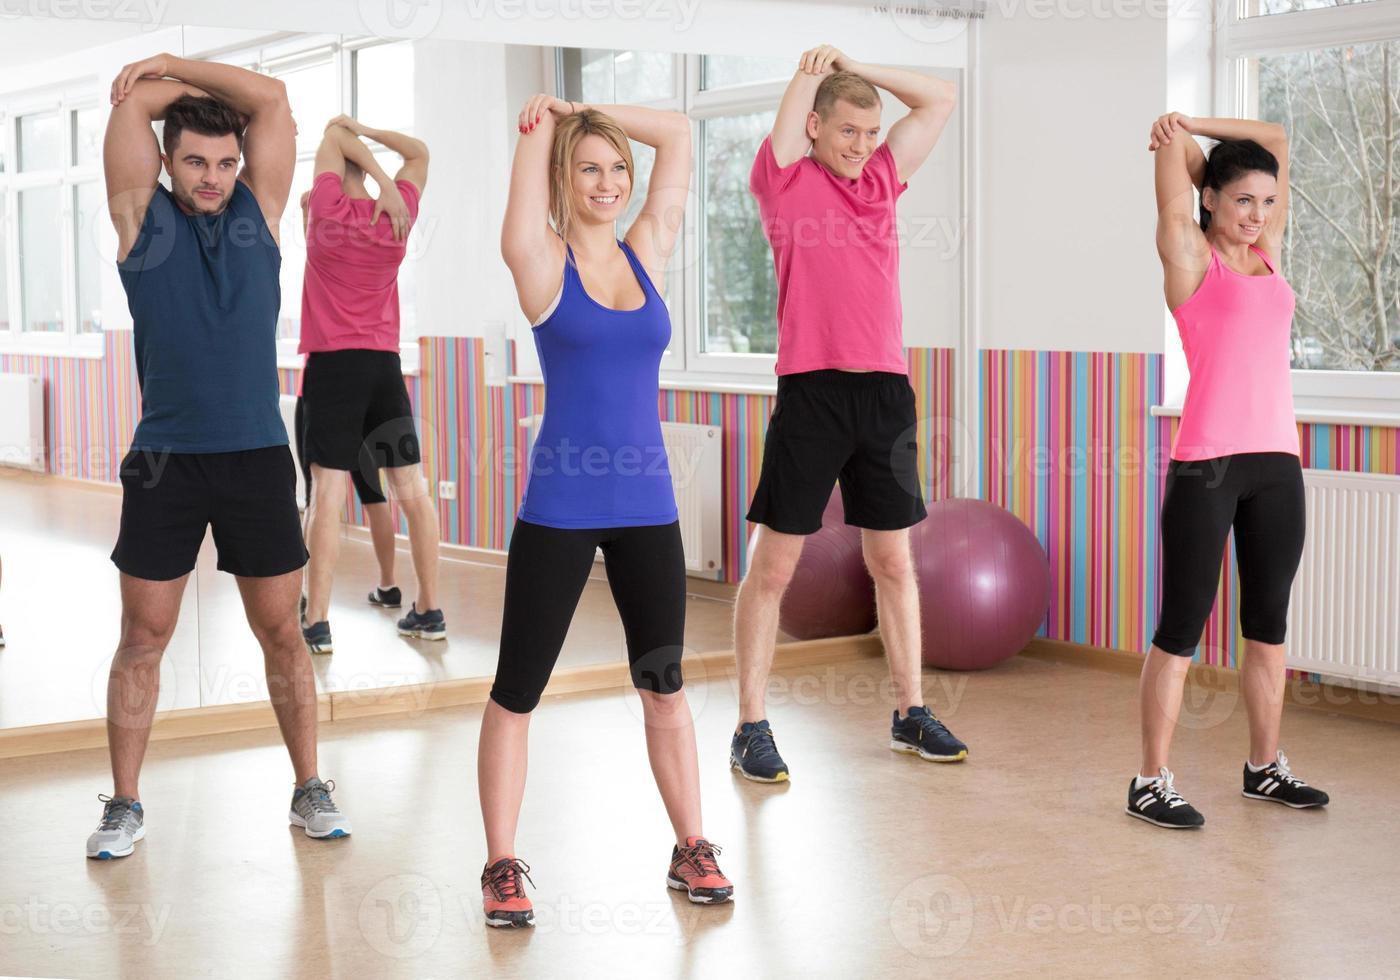 fitnessgroep in de sportschool foto